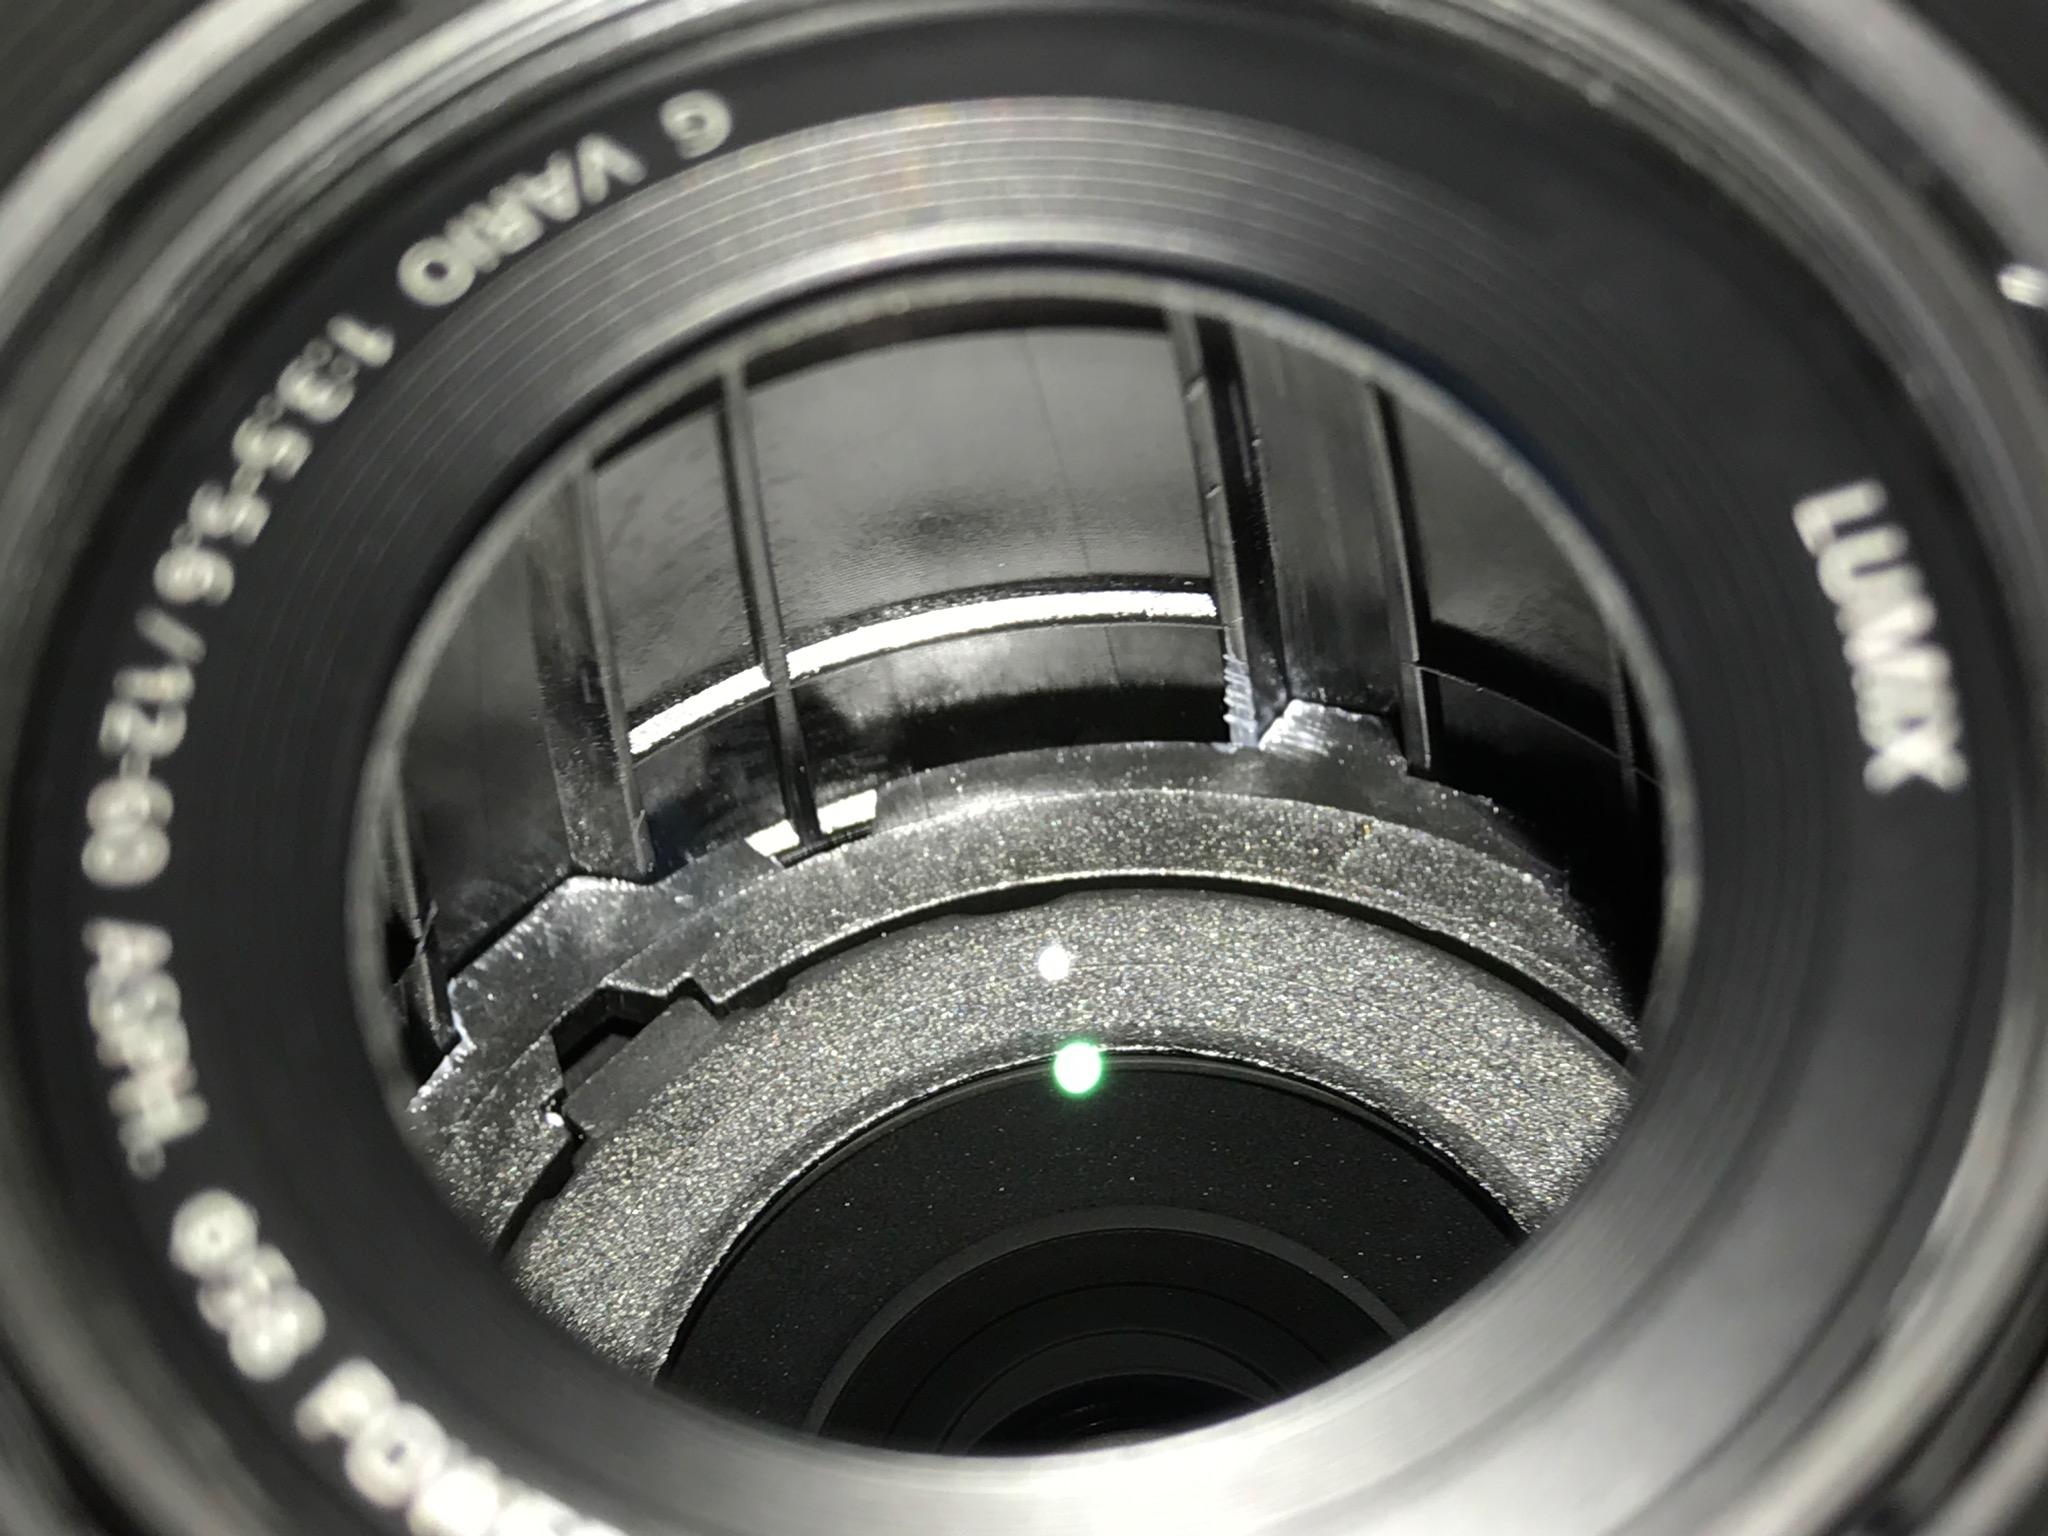 Harga Dan Spesifikasi Panasonic Lumix Dmc G85 Kit 14 42mm F 35 56 Gx85 12 32mm Black Hitam What If Some Of Early Panny 60 Reviews Were Wrong Micro Four